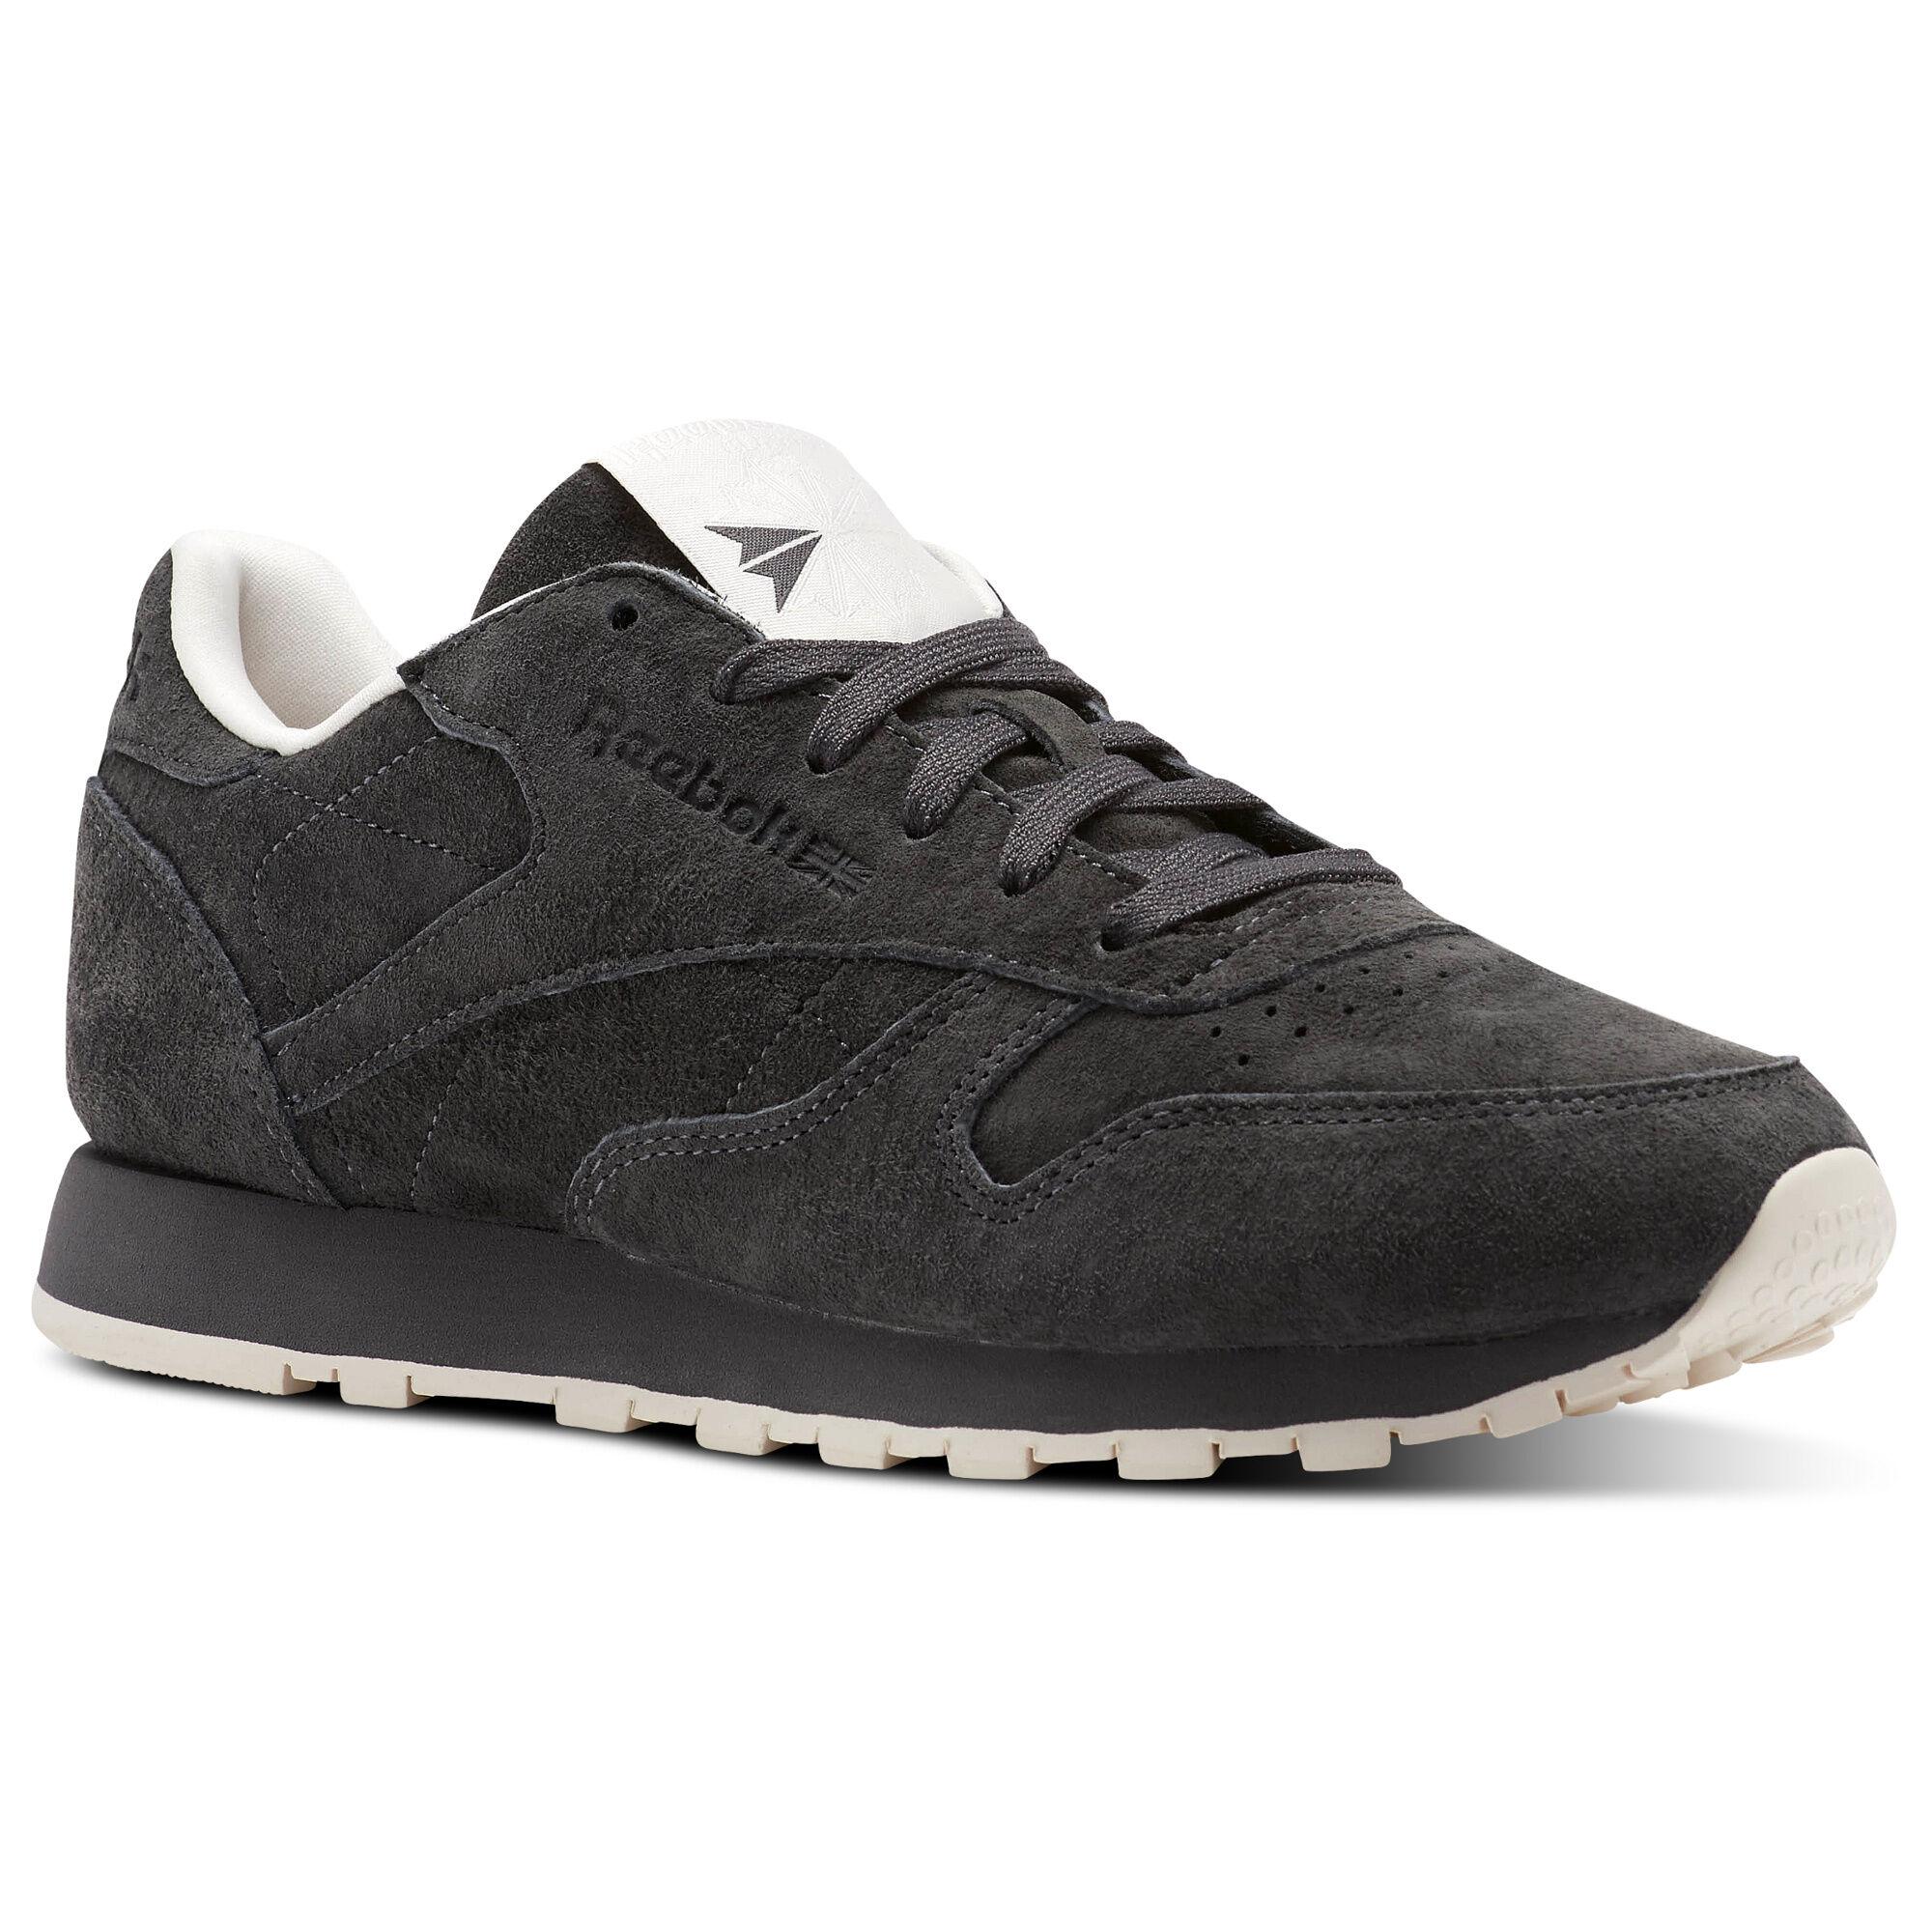 91f730182326 ... reebok classic leather tonal nbk ash grey pale pink bs9881